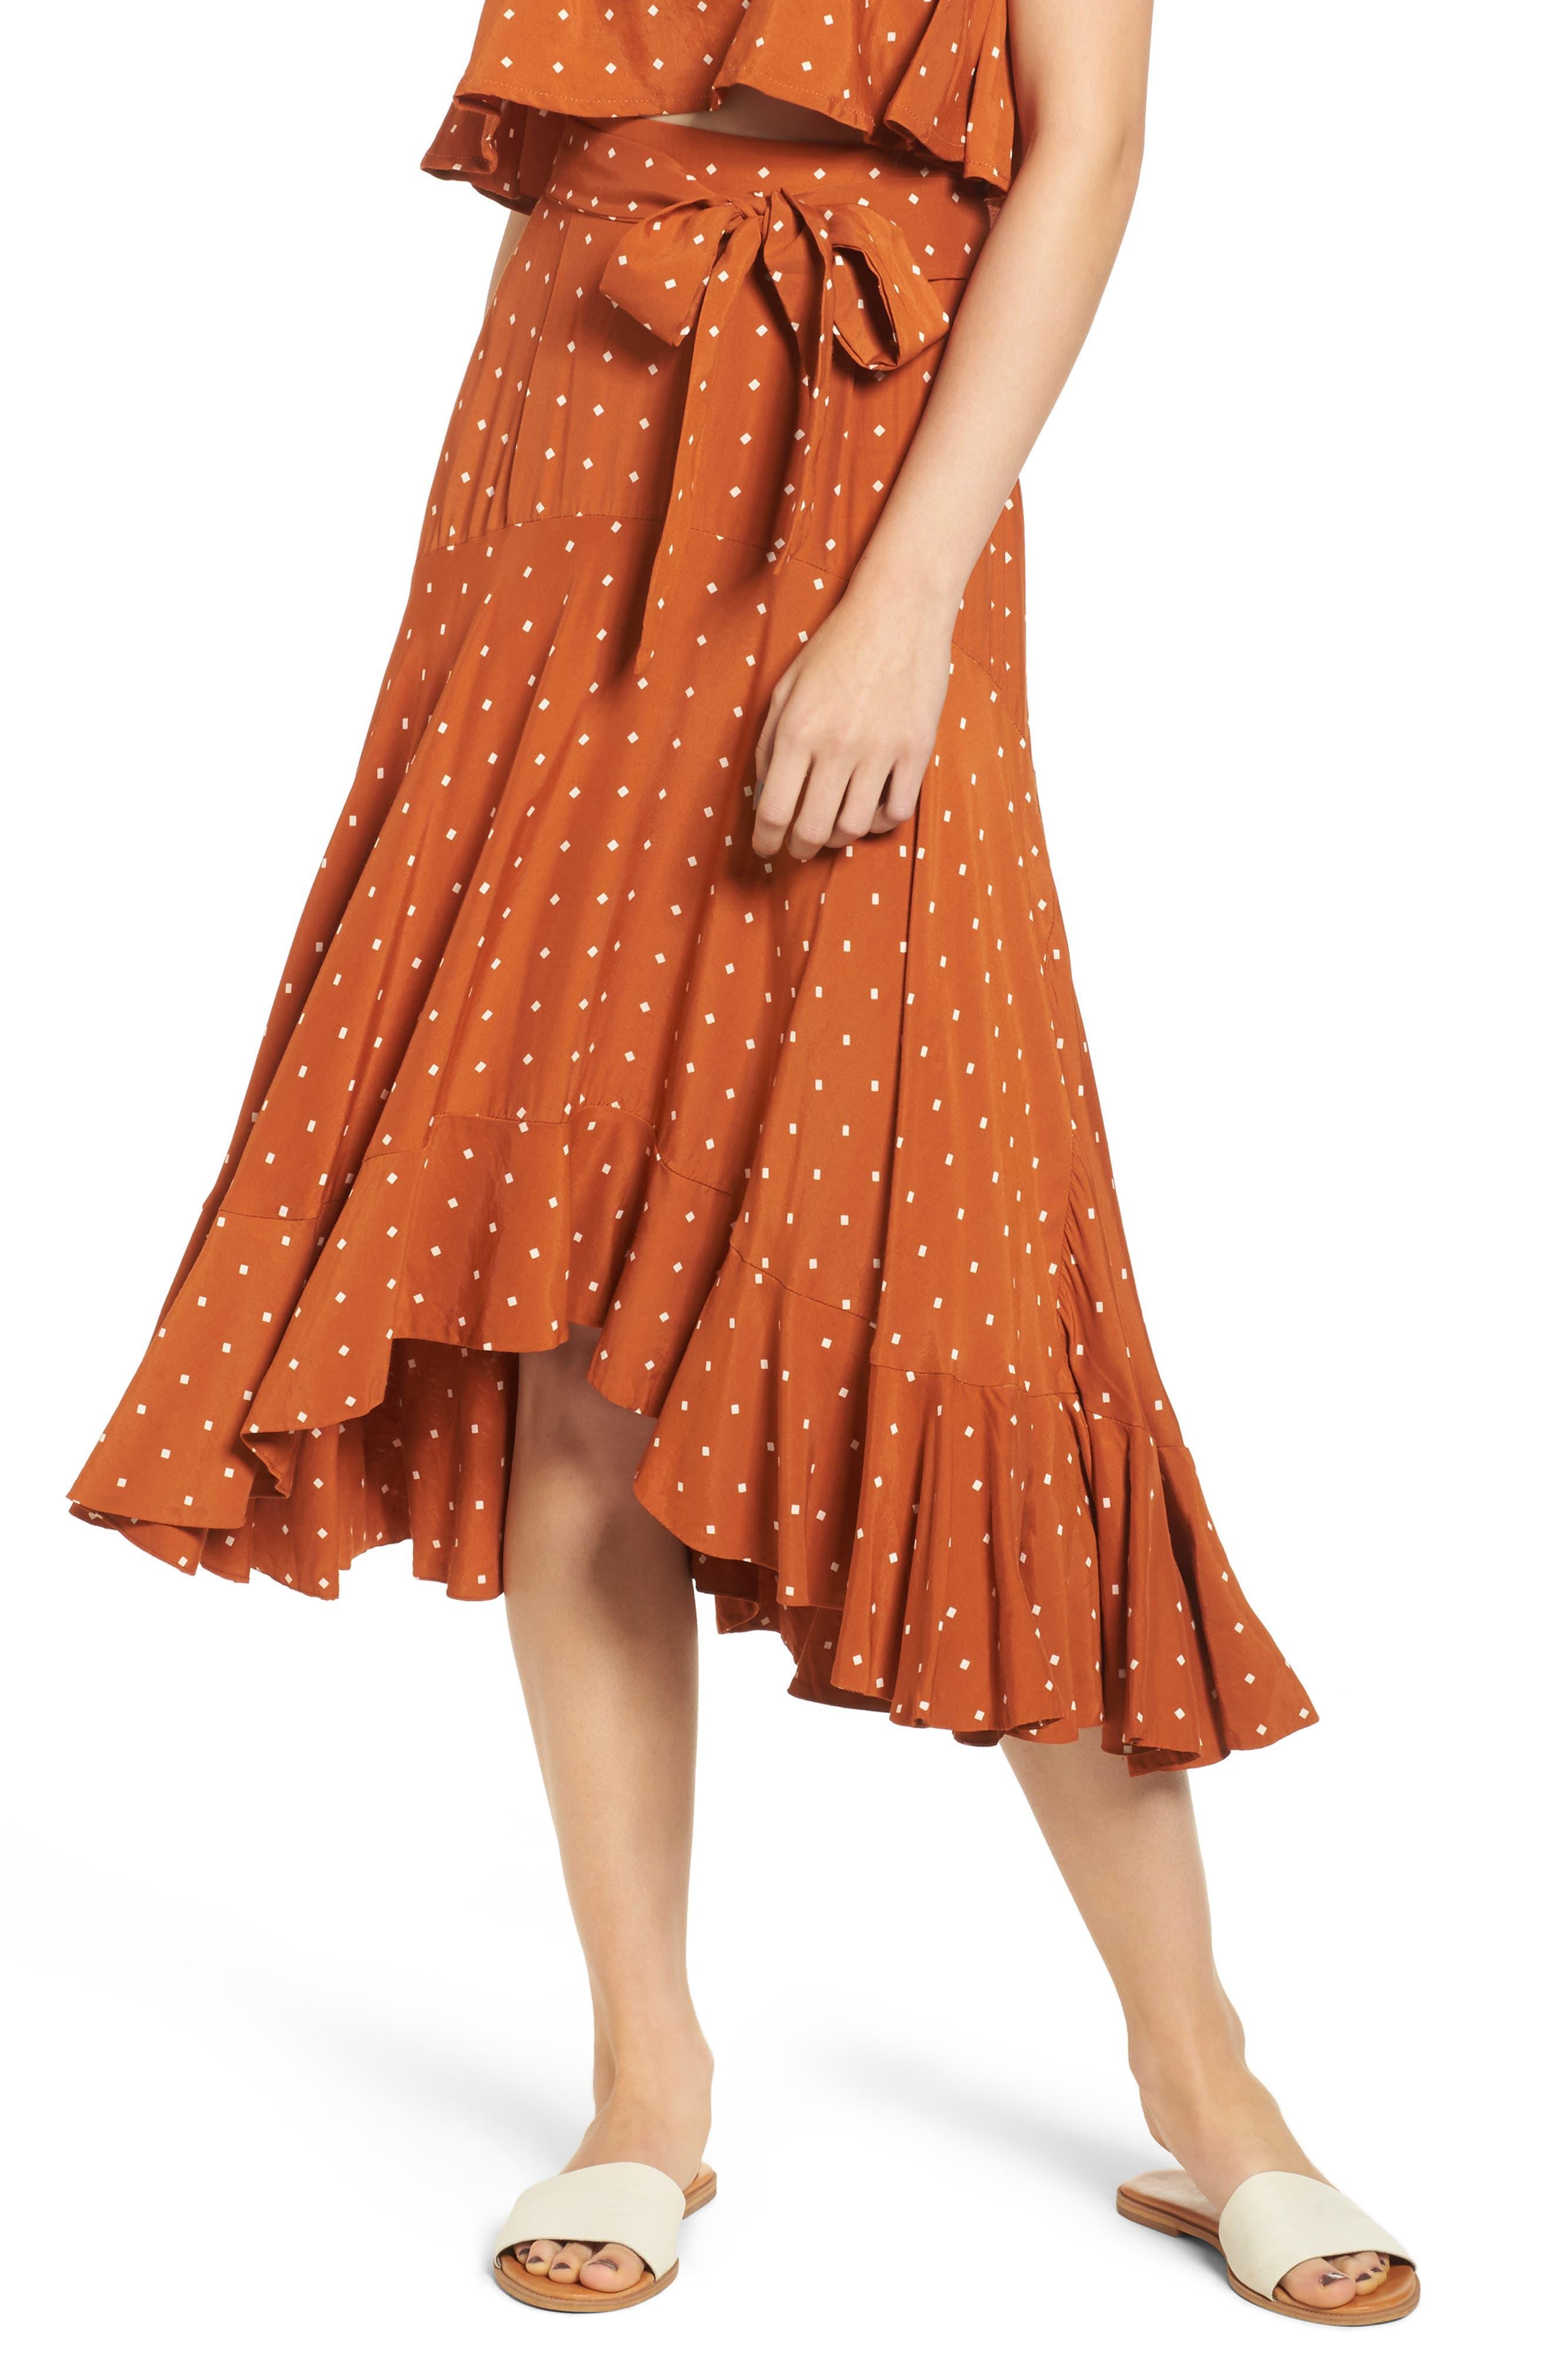 Main Image - FAITHFULL THE BRAND Kamares Polka Dot Midi Skirt